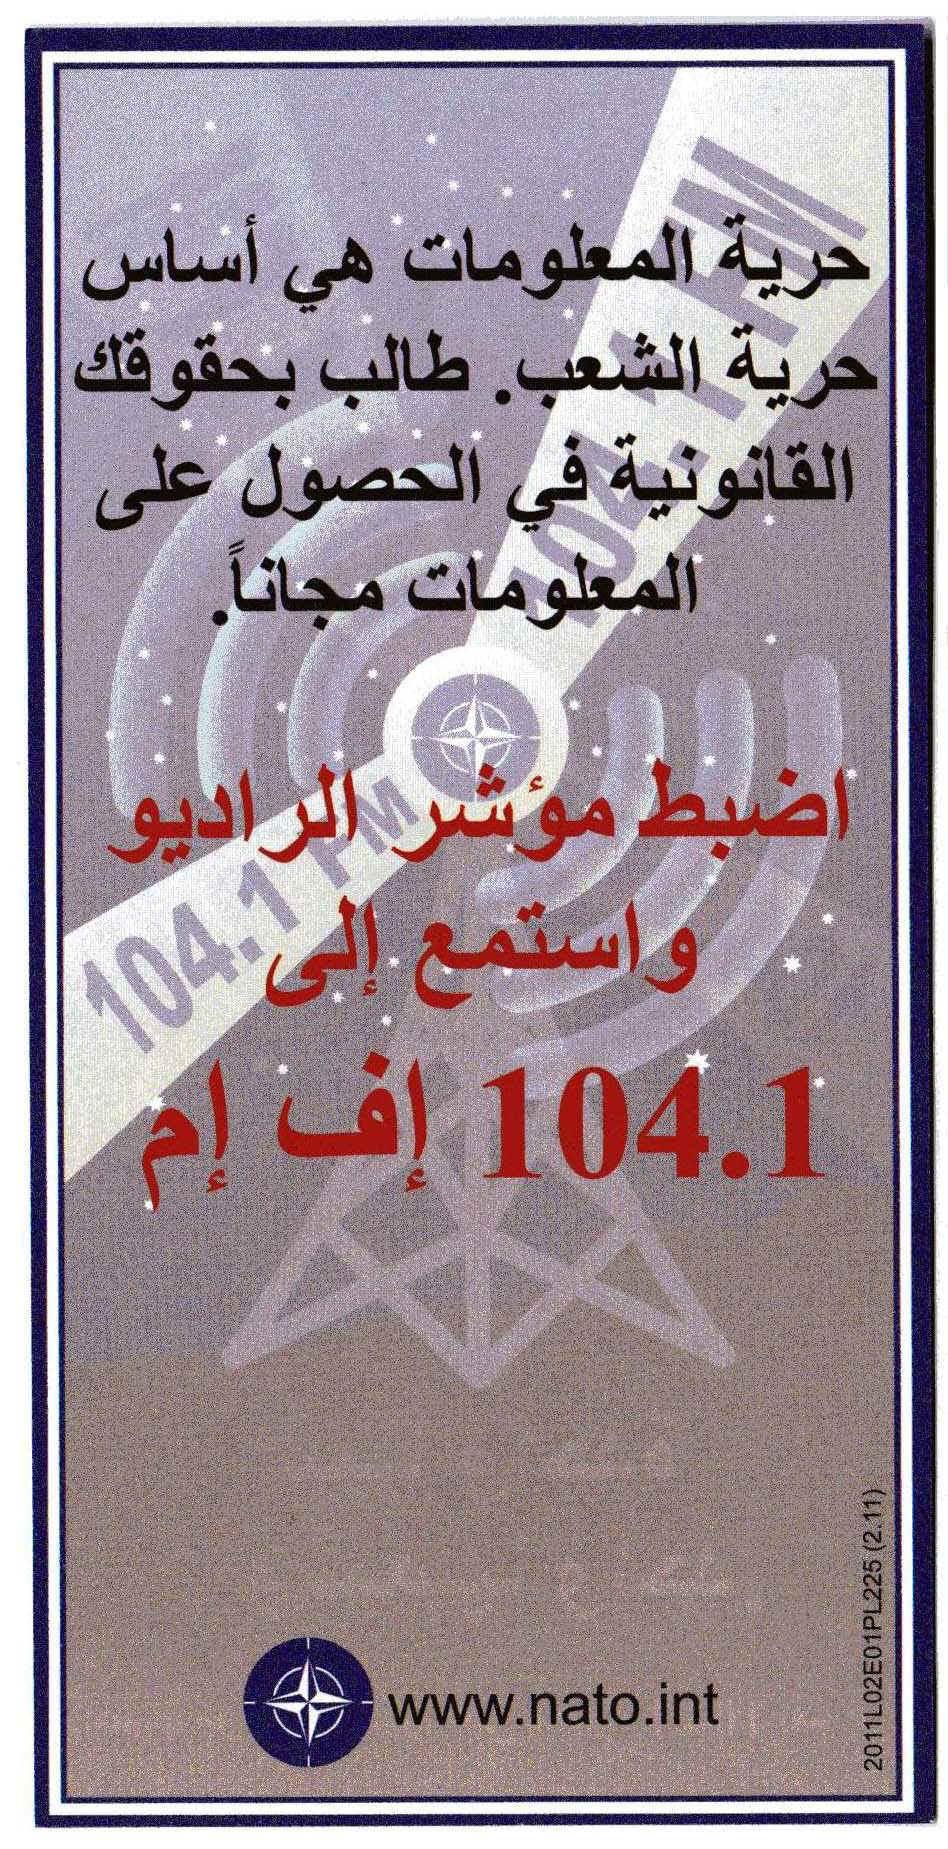 LibyaFM1041B.jpg (486722 bytes)